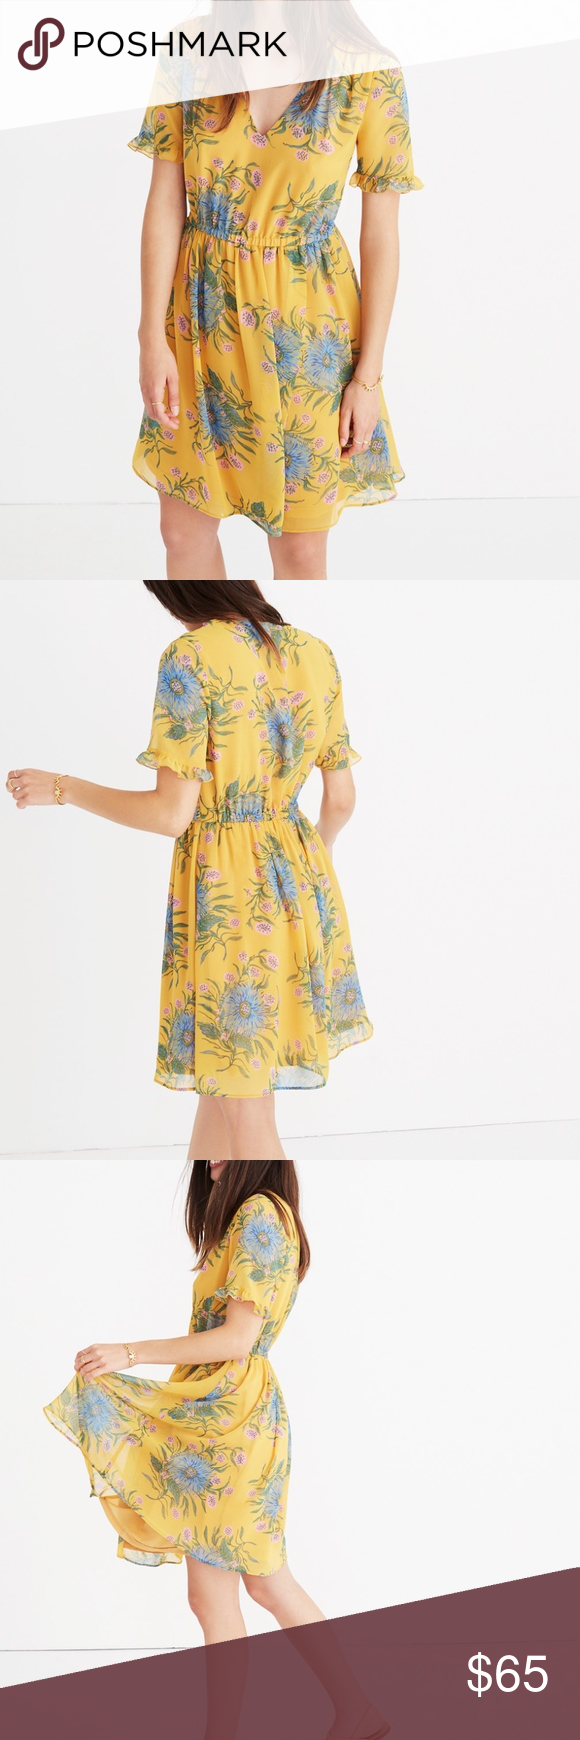 48ecc2cb75 Madewell Sweetgrass Ruffle-Sleeve Dress Sweetgrass Ruffle-Sleeve Dress in Painted  Blooms